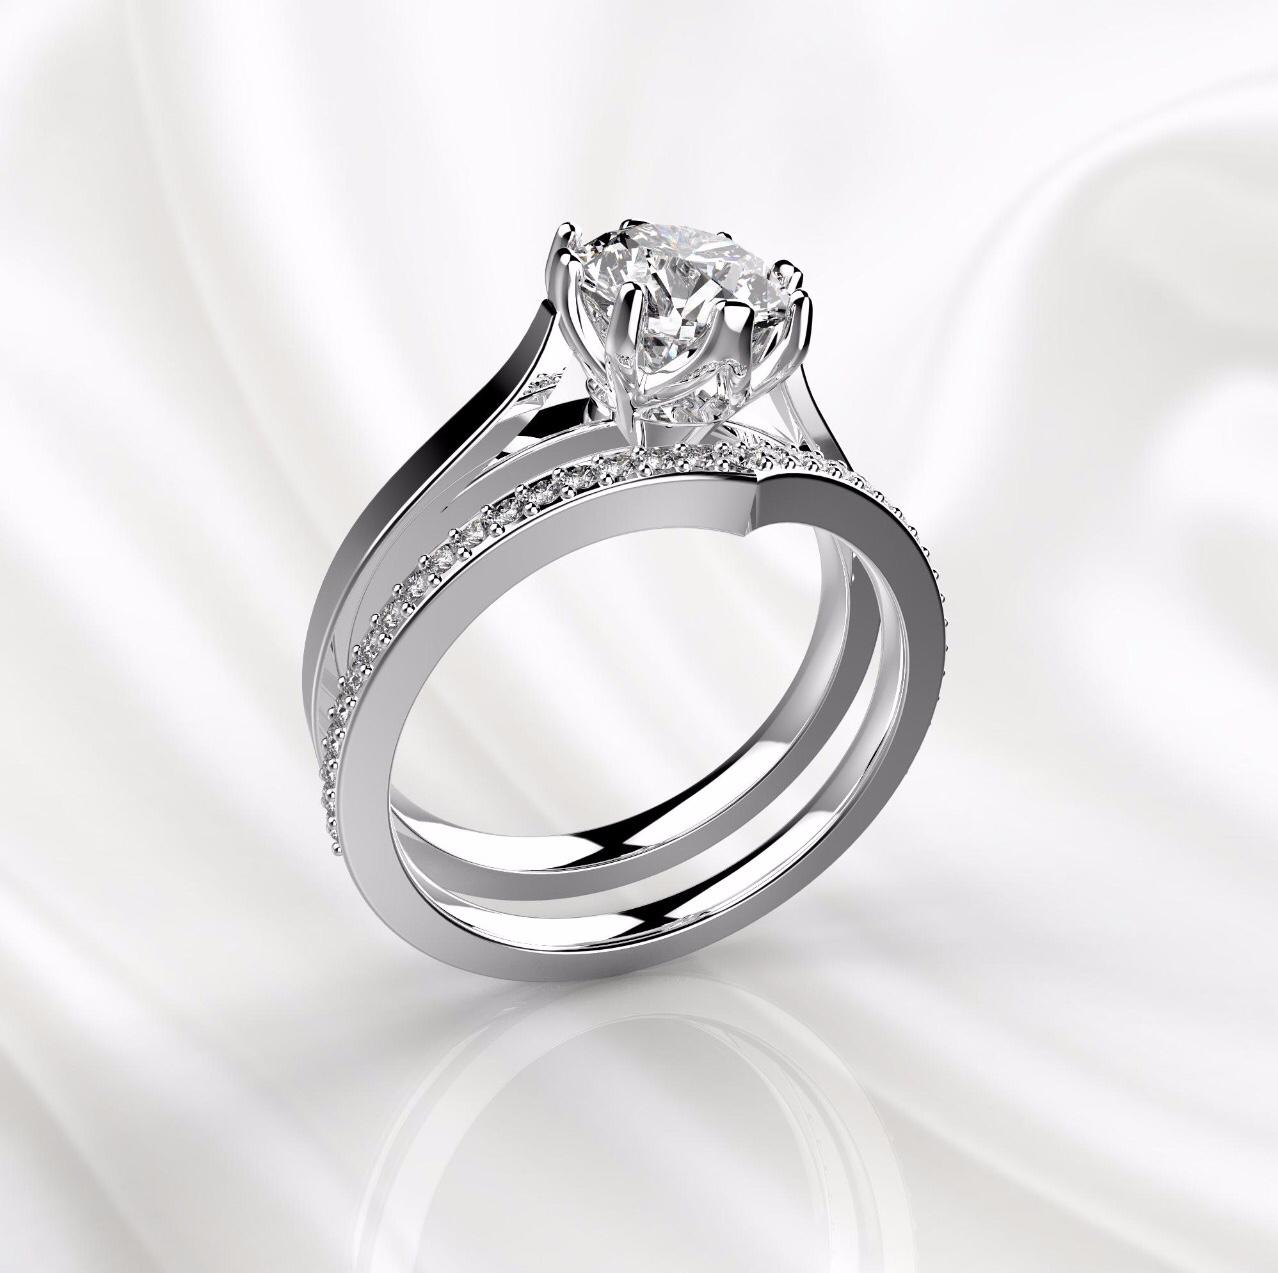 N2 Сет колец для помолвки из белого золота с бриллиантом 1 карат